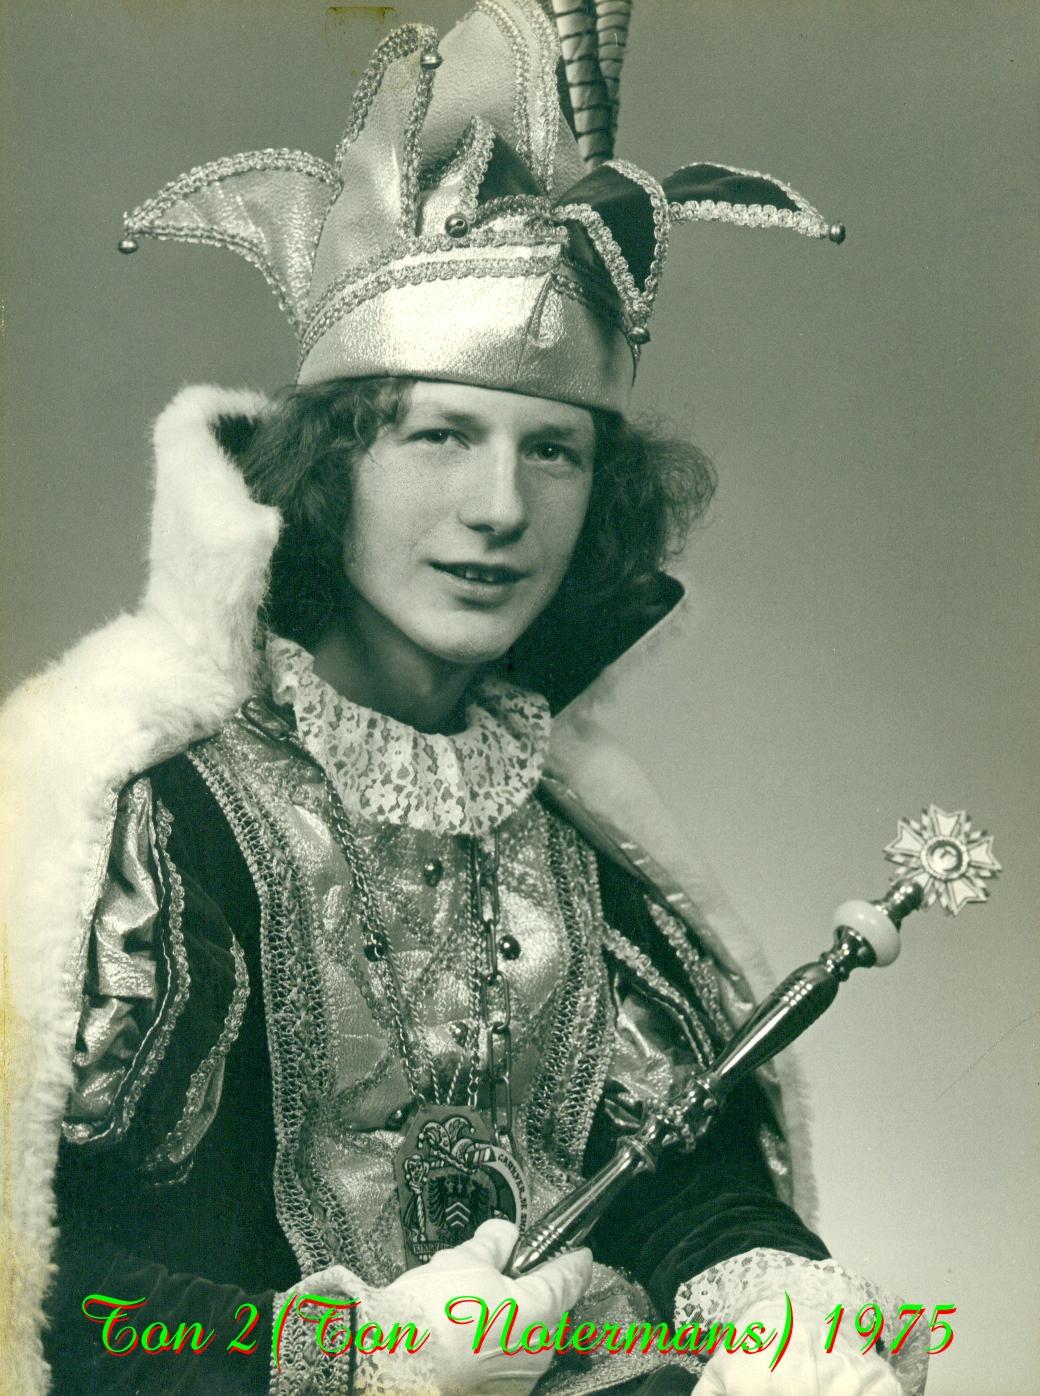 1976 Prins Ton (II) Notermans